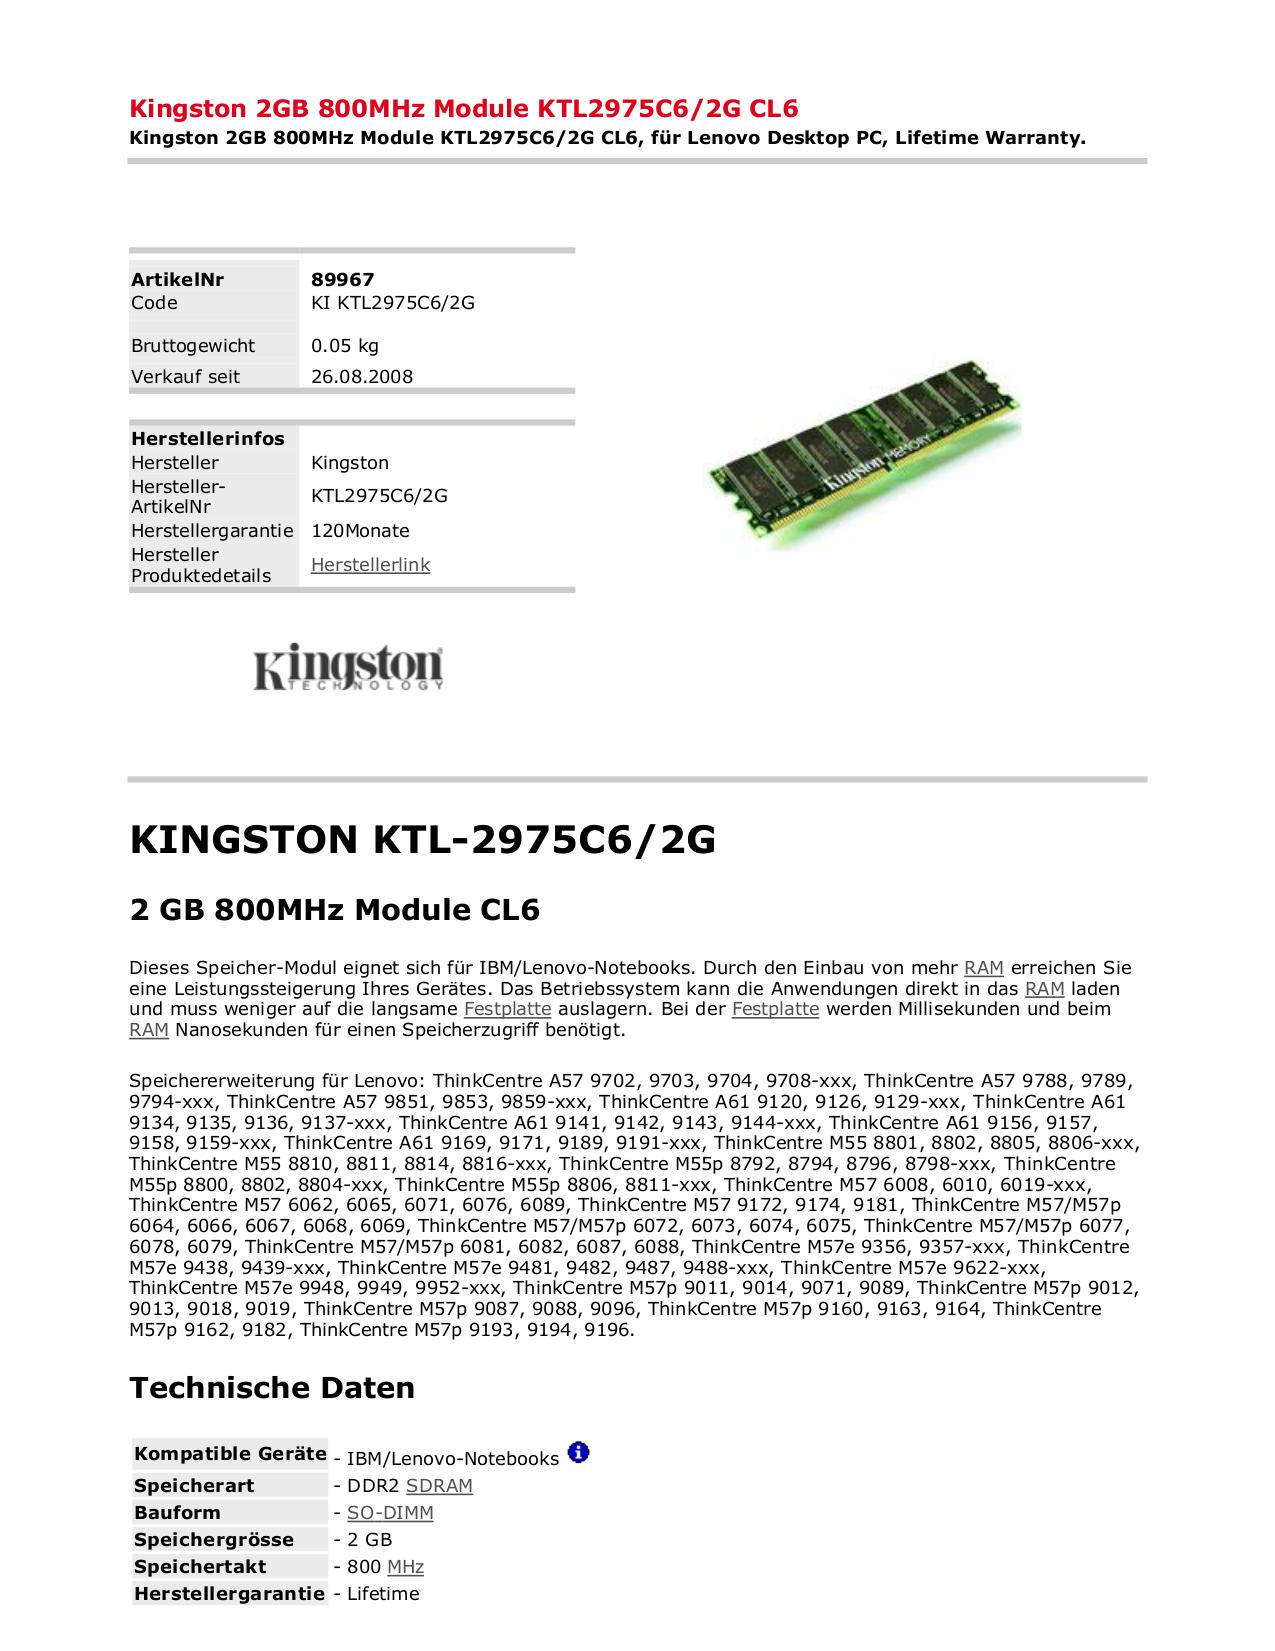 pdf for Lenovo Desktop ThinkCentre A57 9703 manual